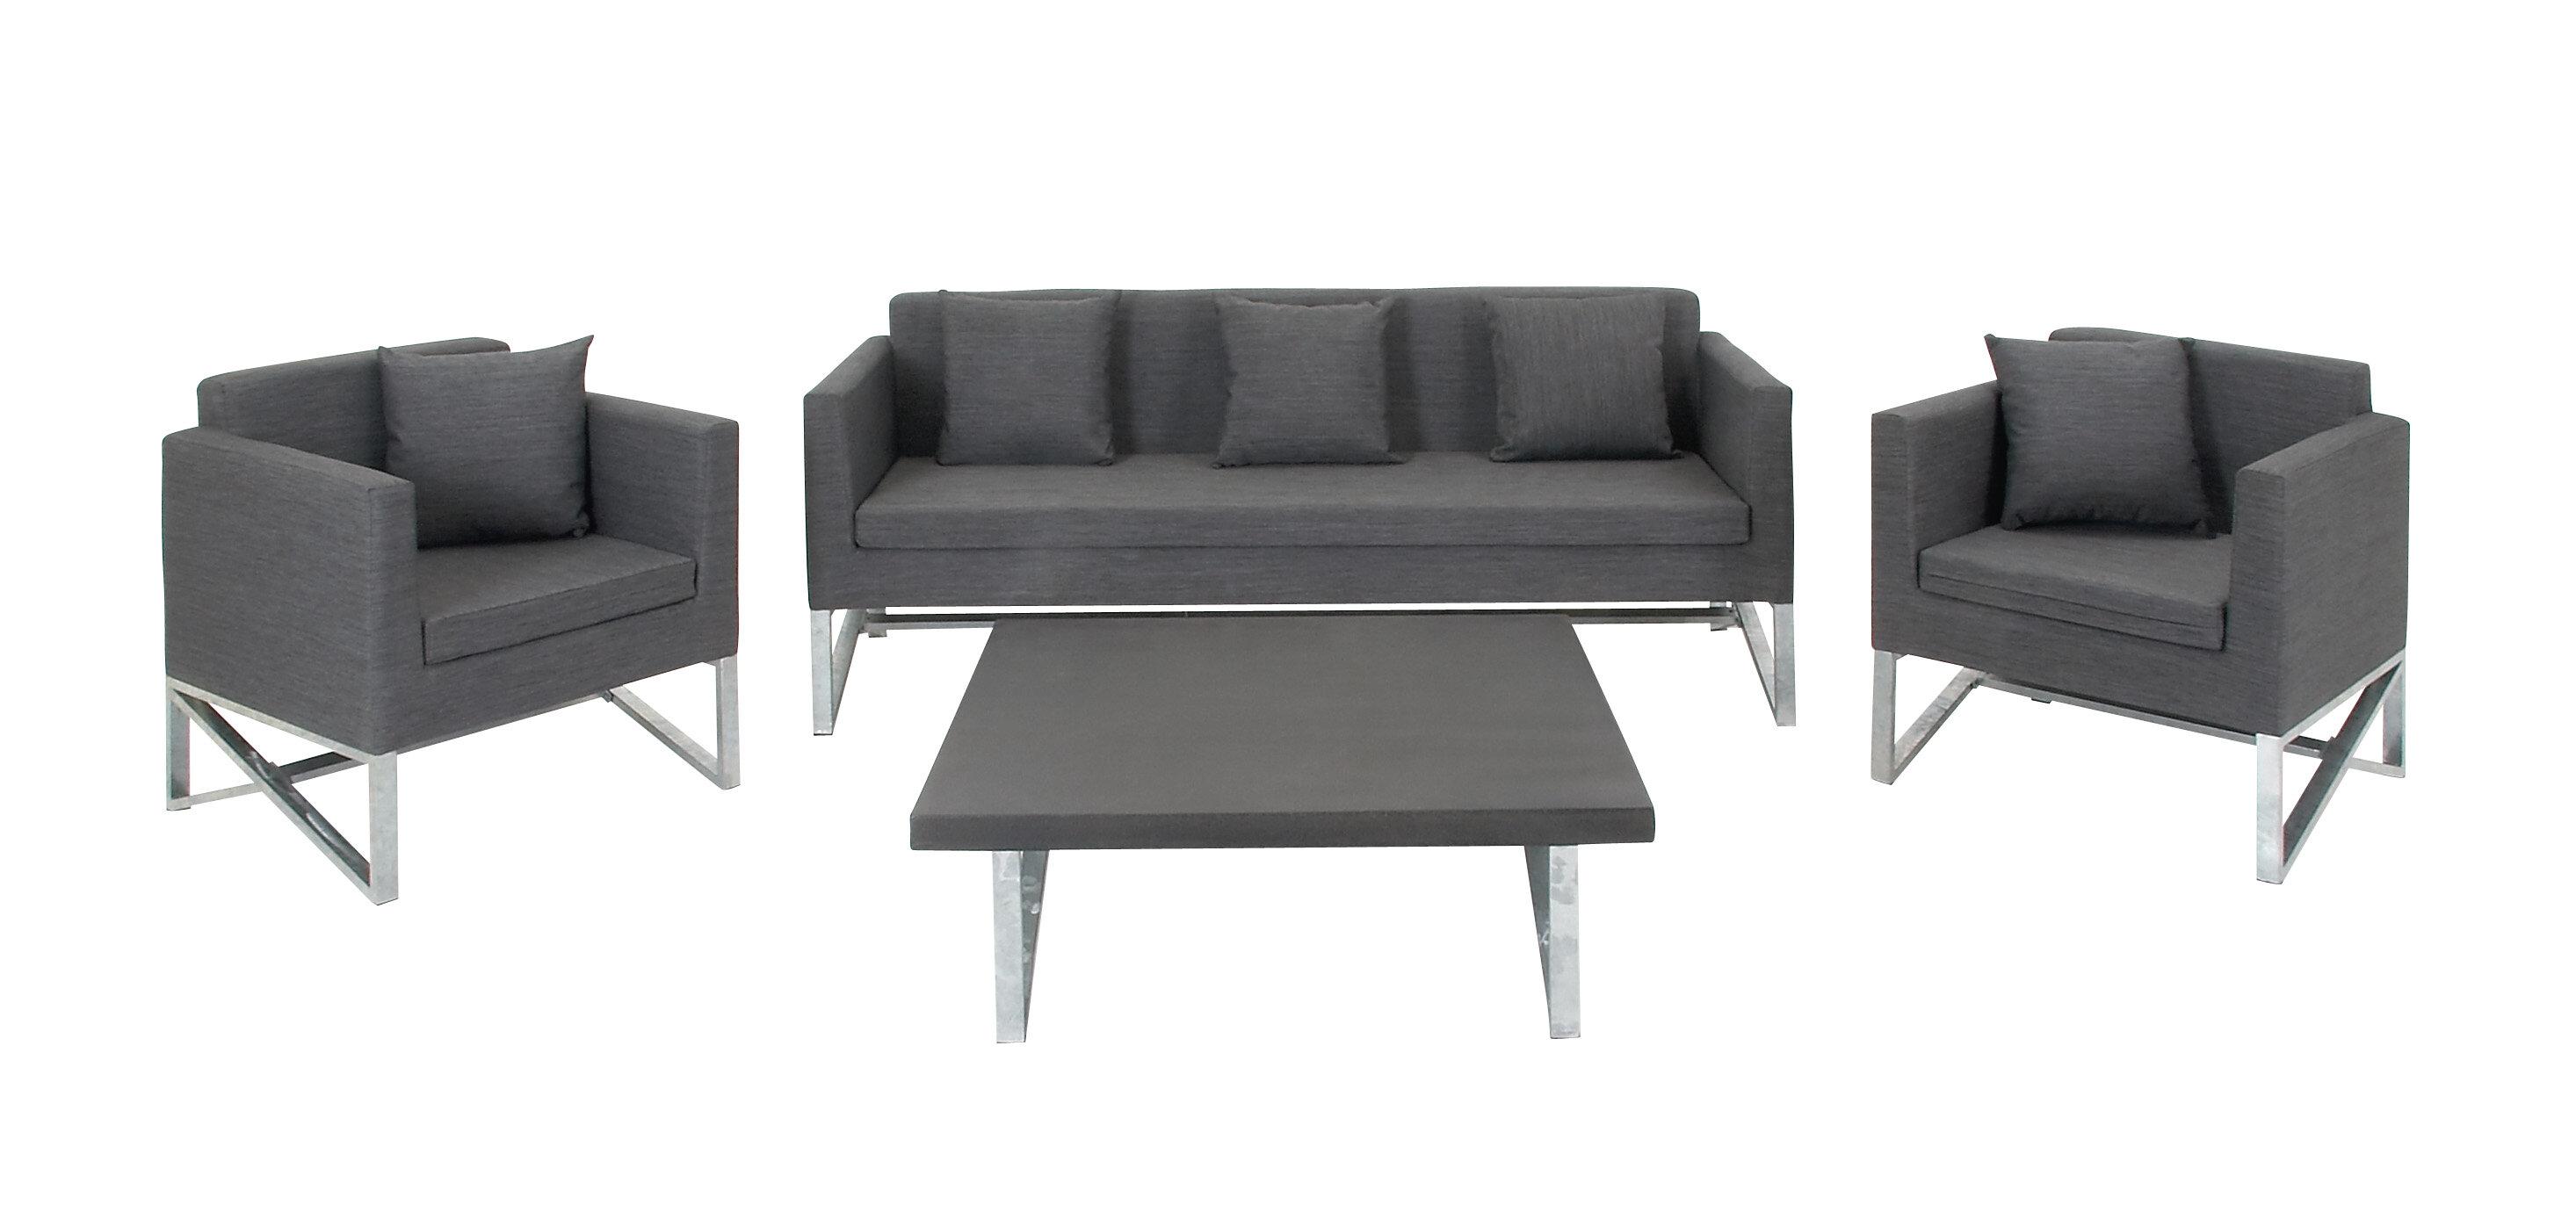 Hogle 4 Piece Living Room Set | Joss & Main